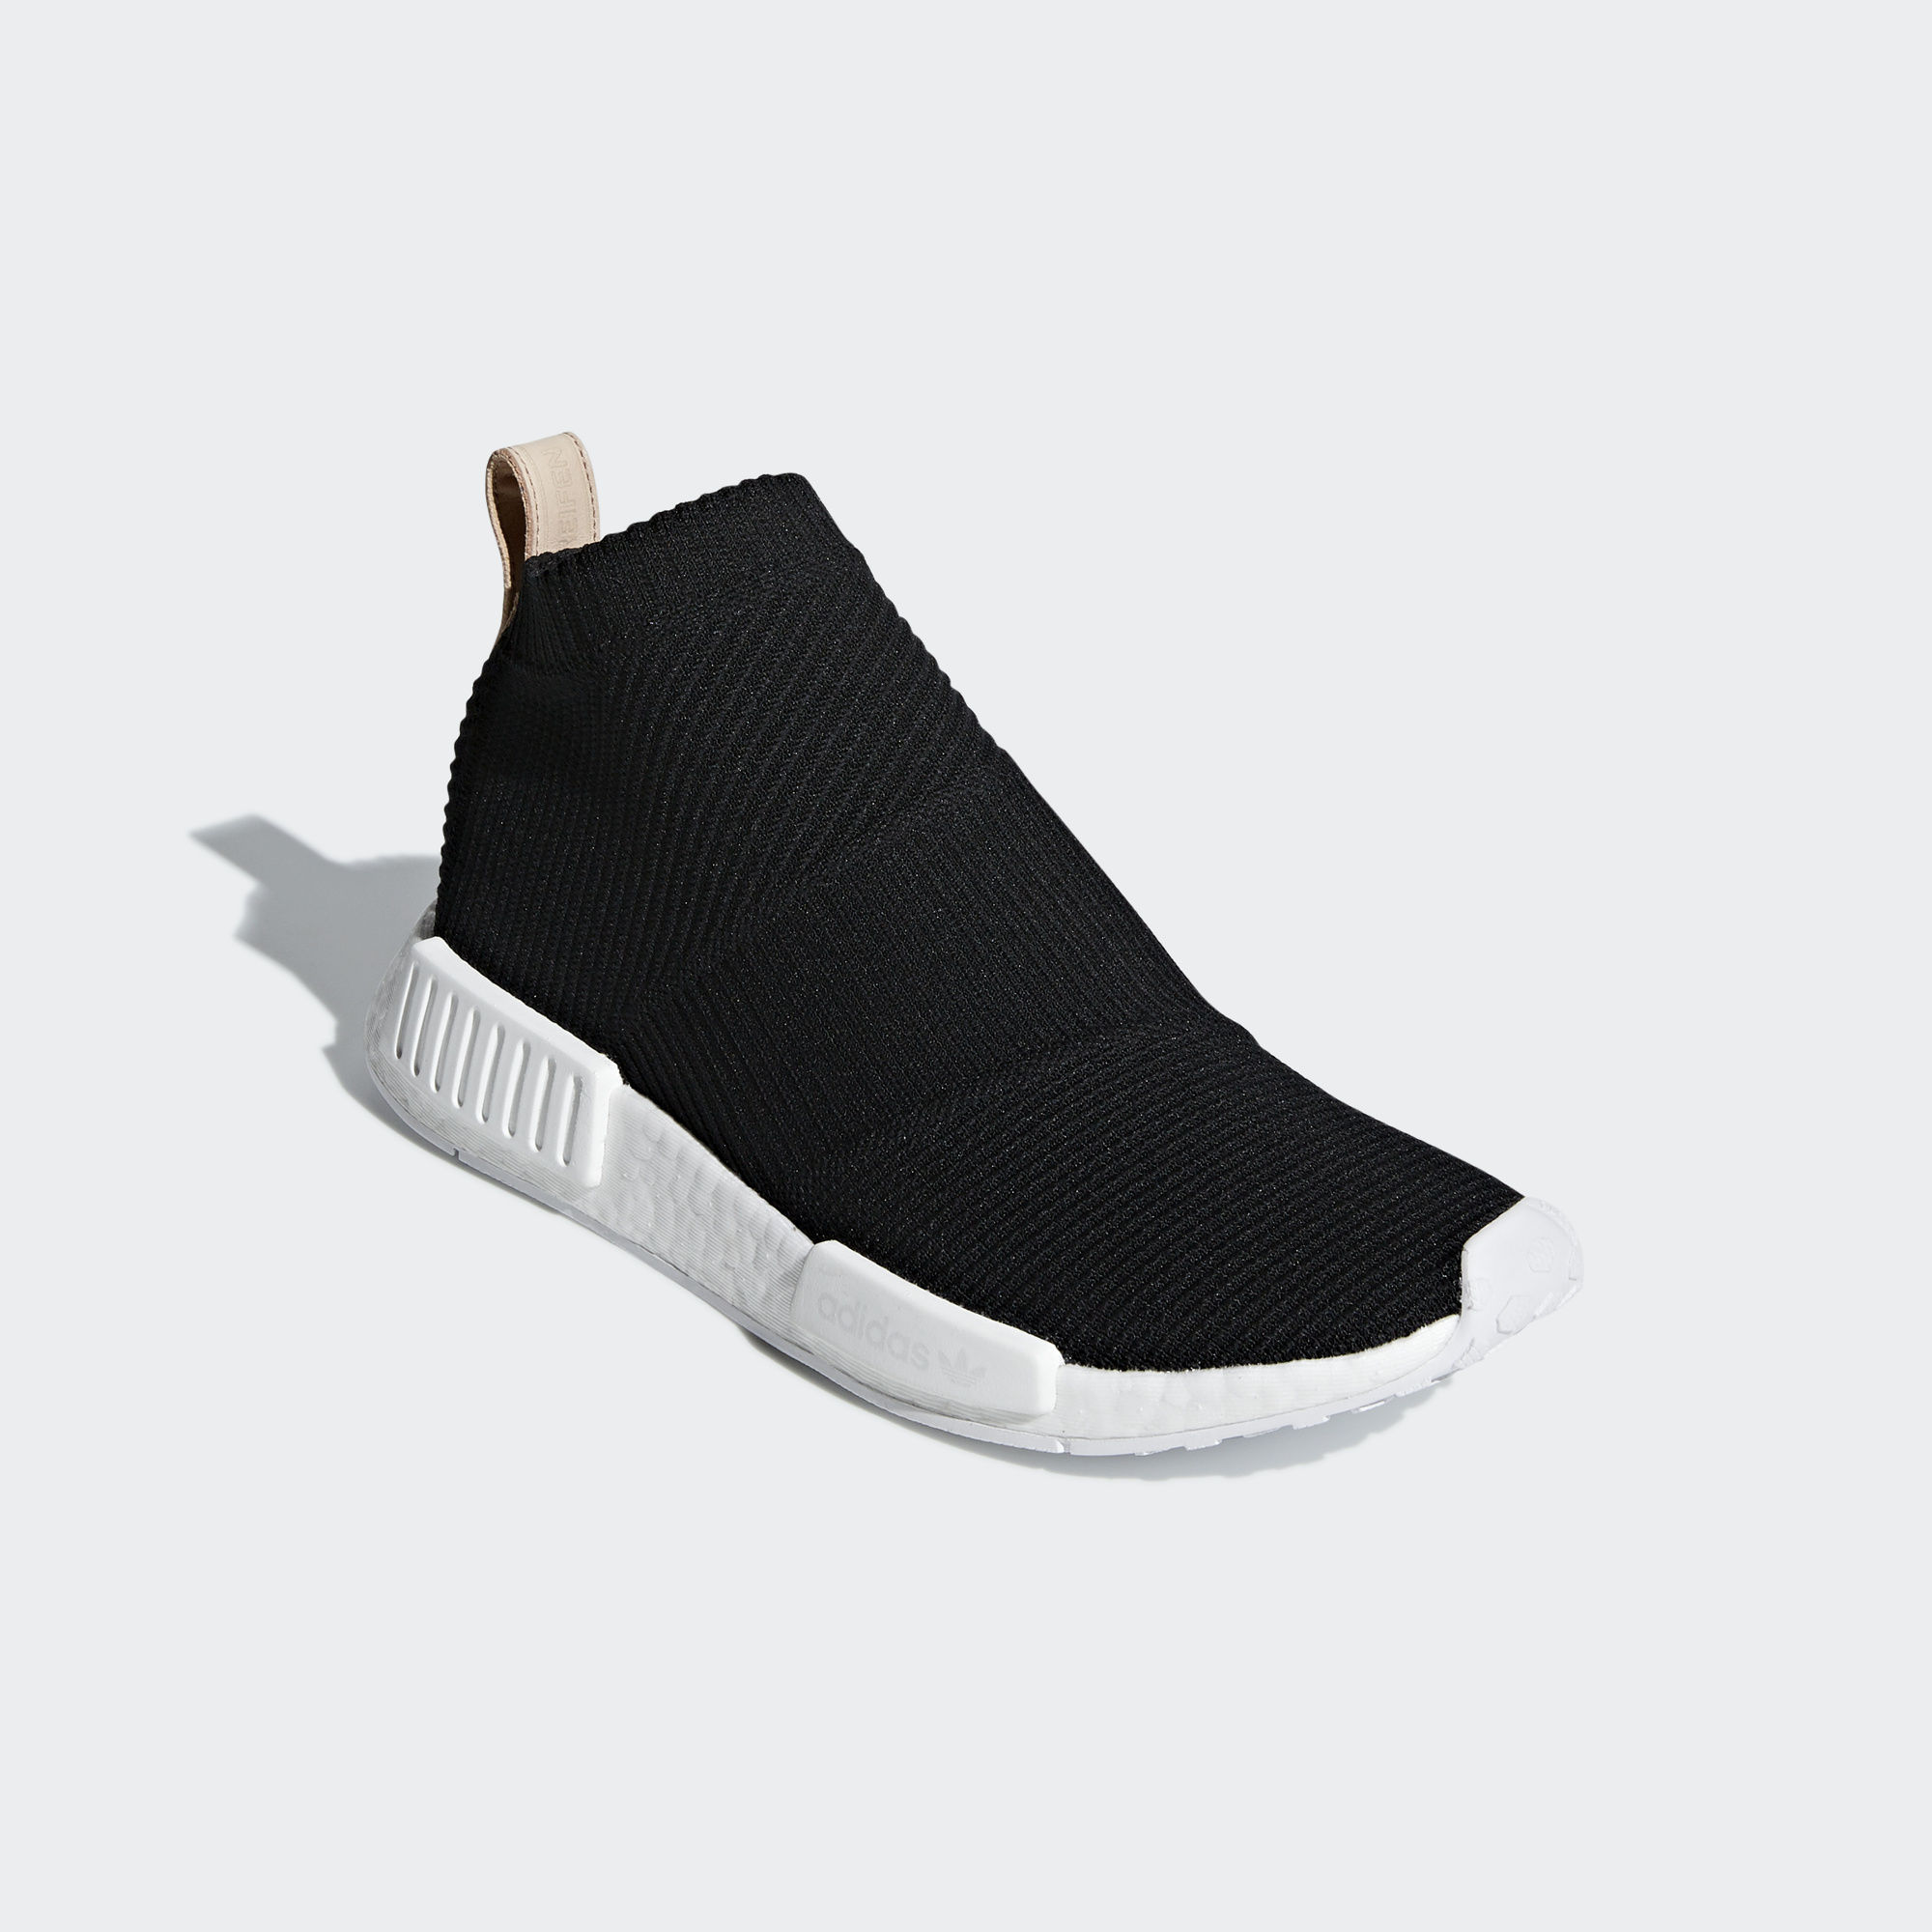 Adidas NMD_CS1 Core Black / Core Blue / Ftwr White (AQ0948)